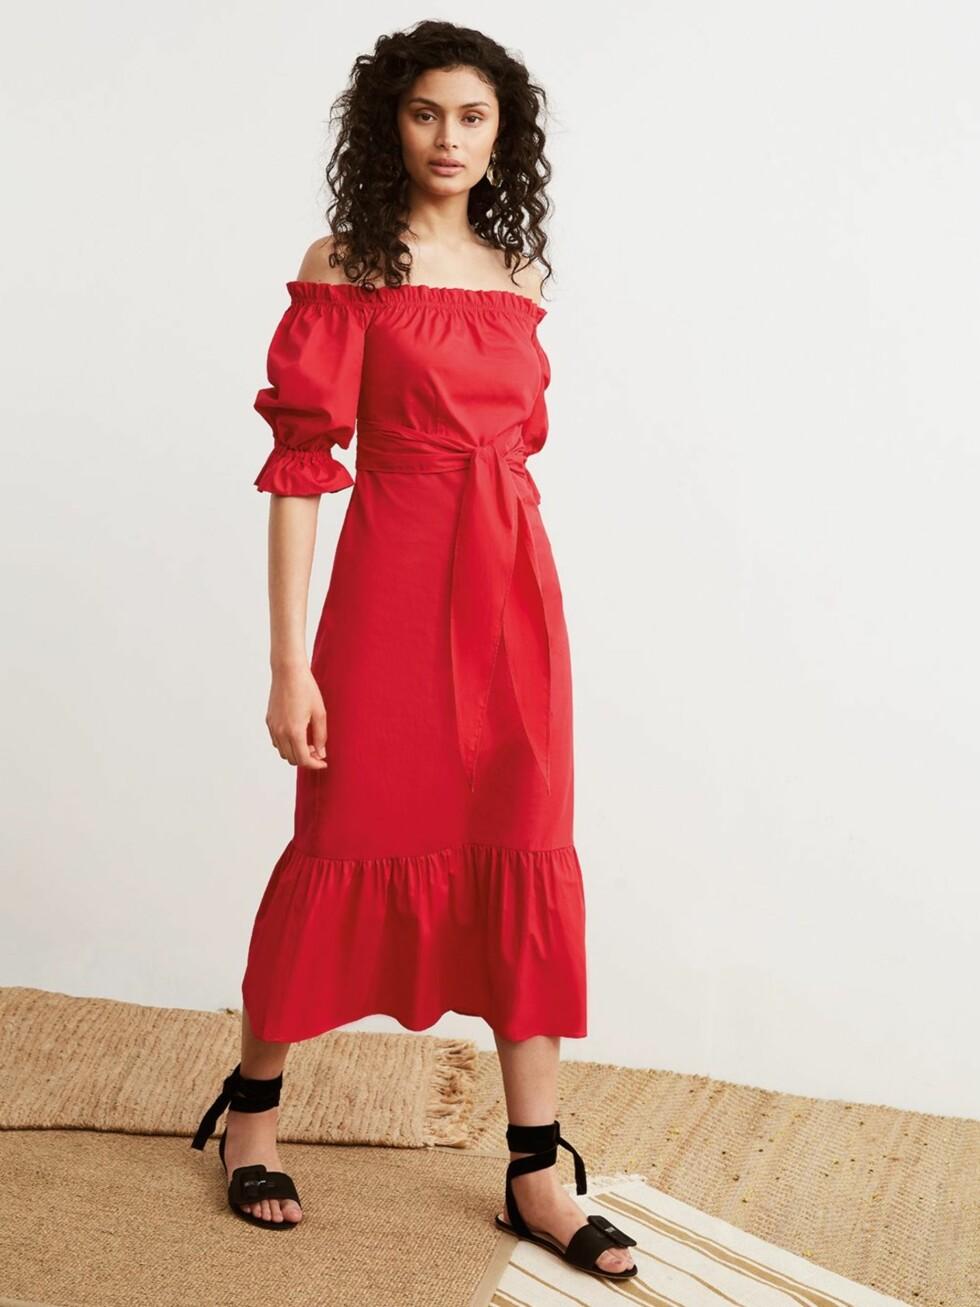 Rød kjole fra Kitri Studio |1442,-| https://kitristudio.eu/collections/fresh-in/products/cora-red-cotton-bardot-summer-dress